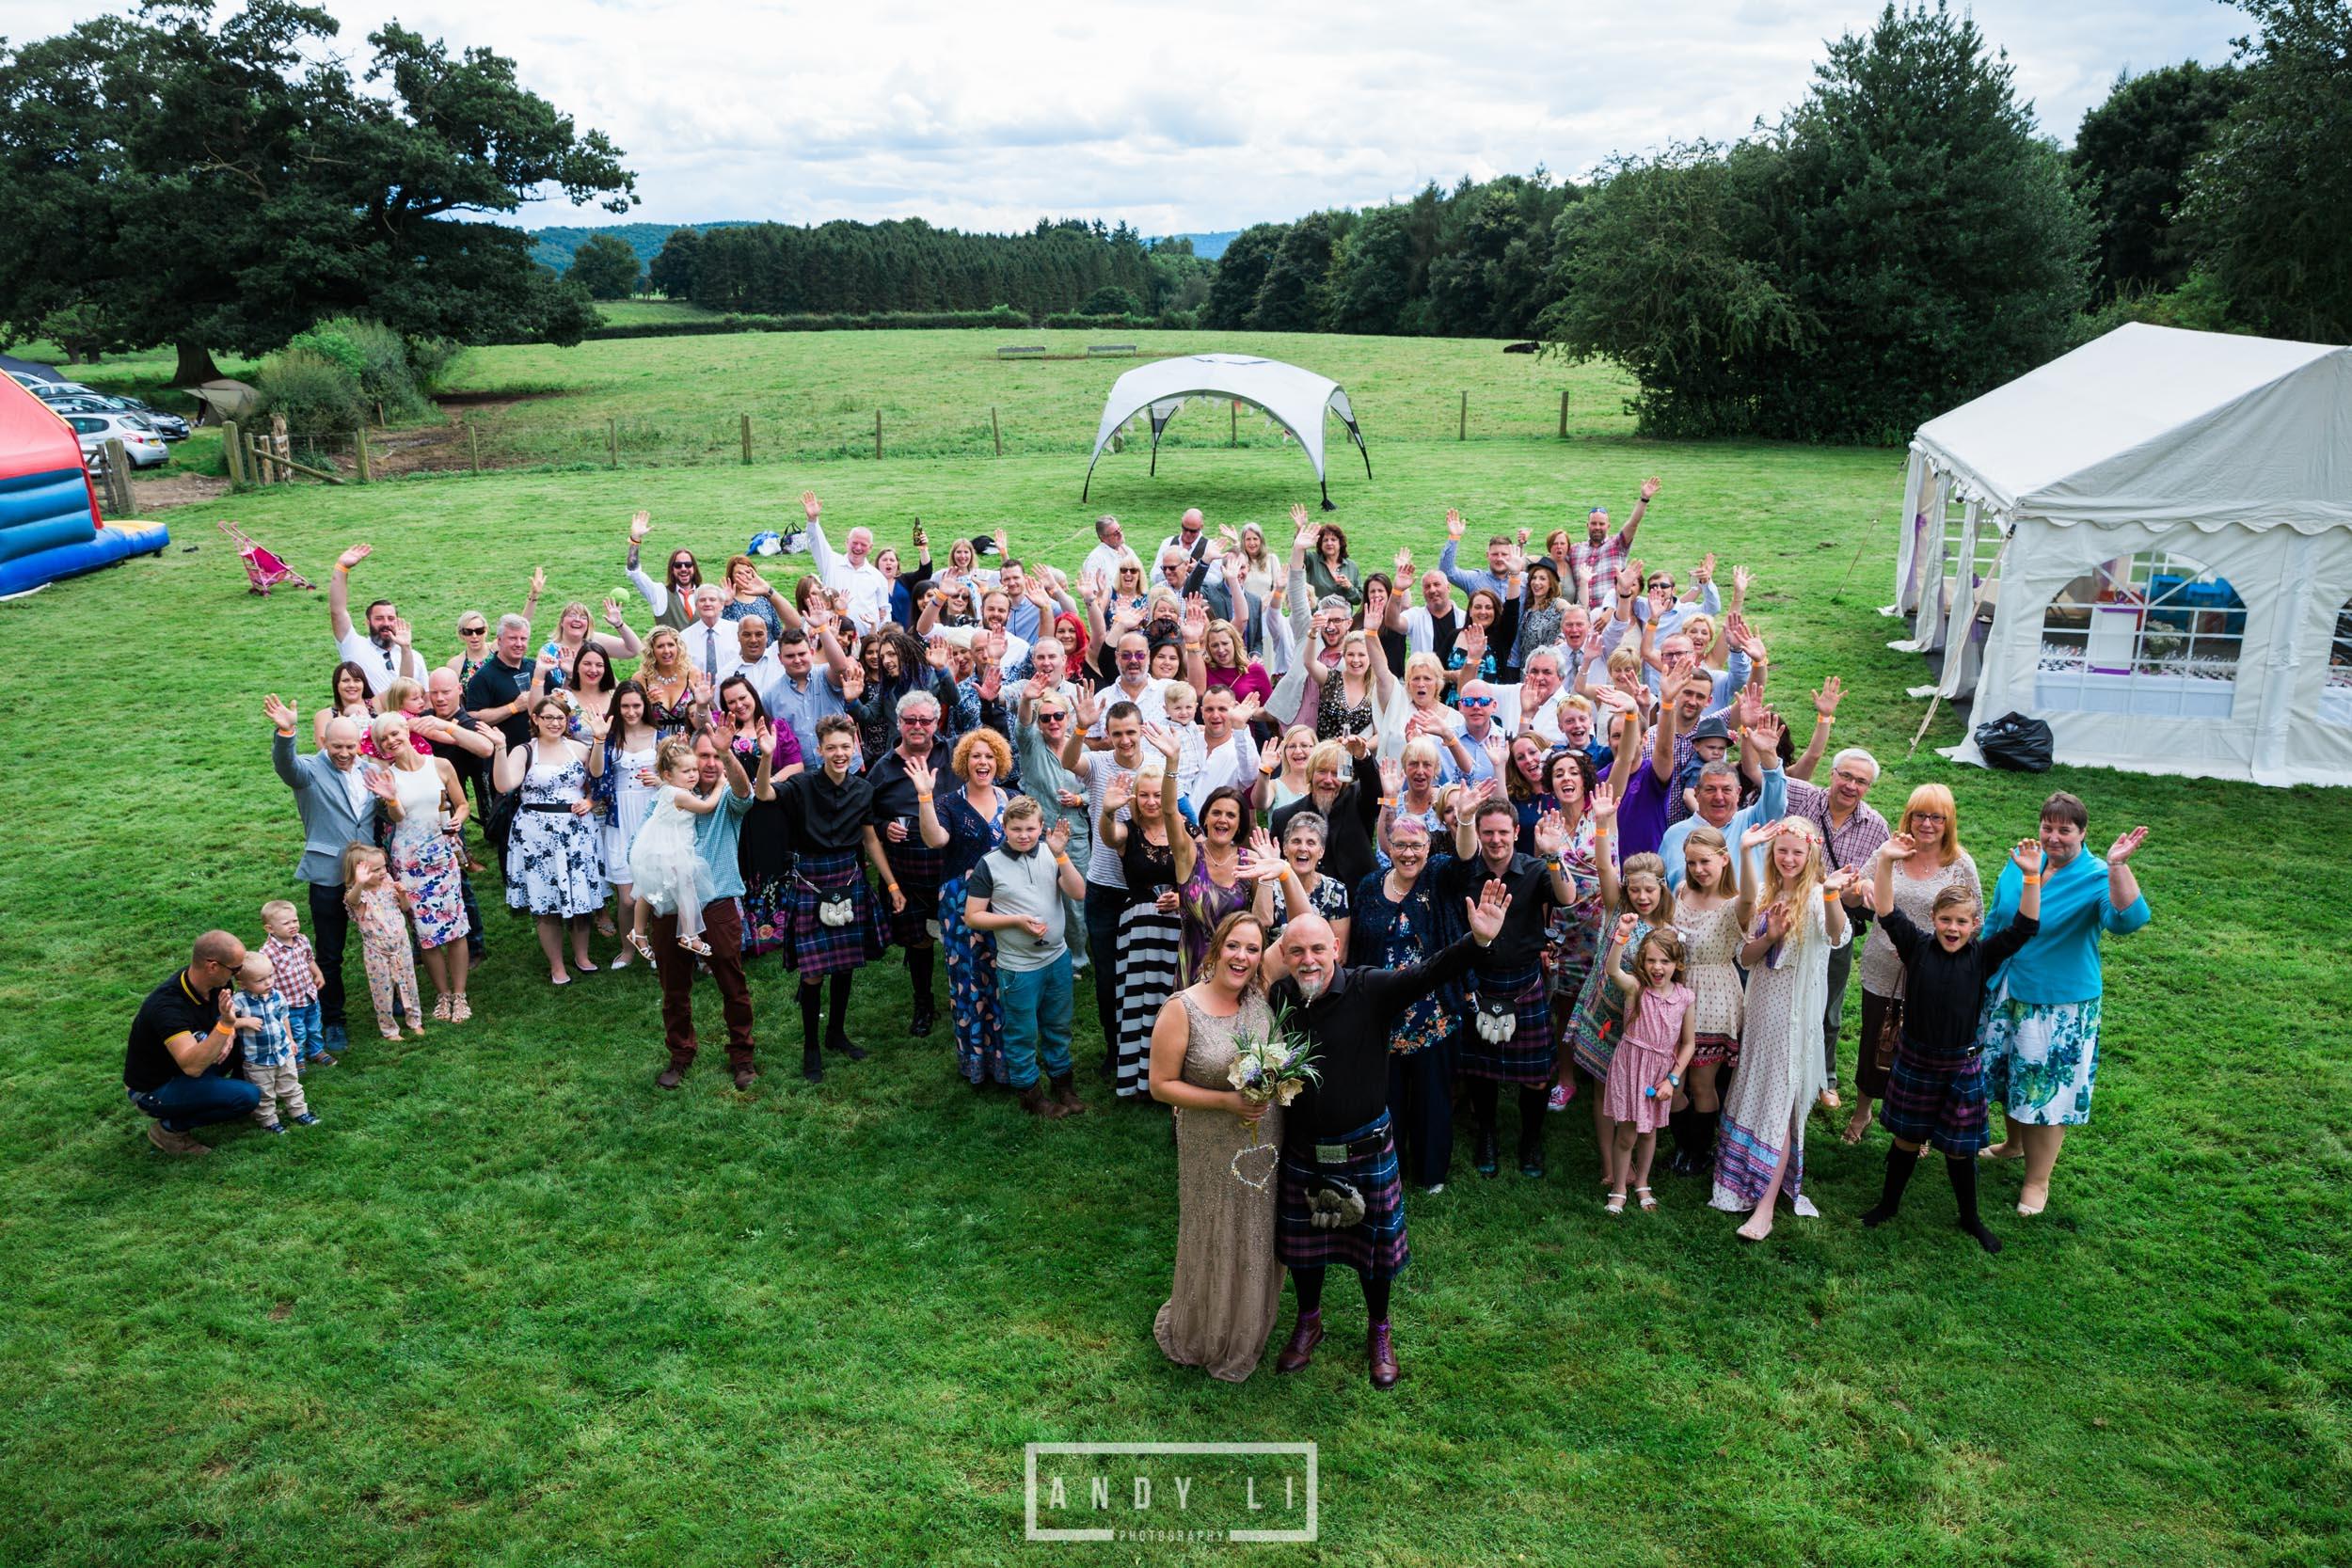 Festival Wedding Shropshire-Andy Li Photography-169.jpg